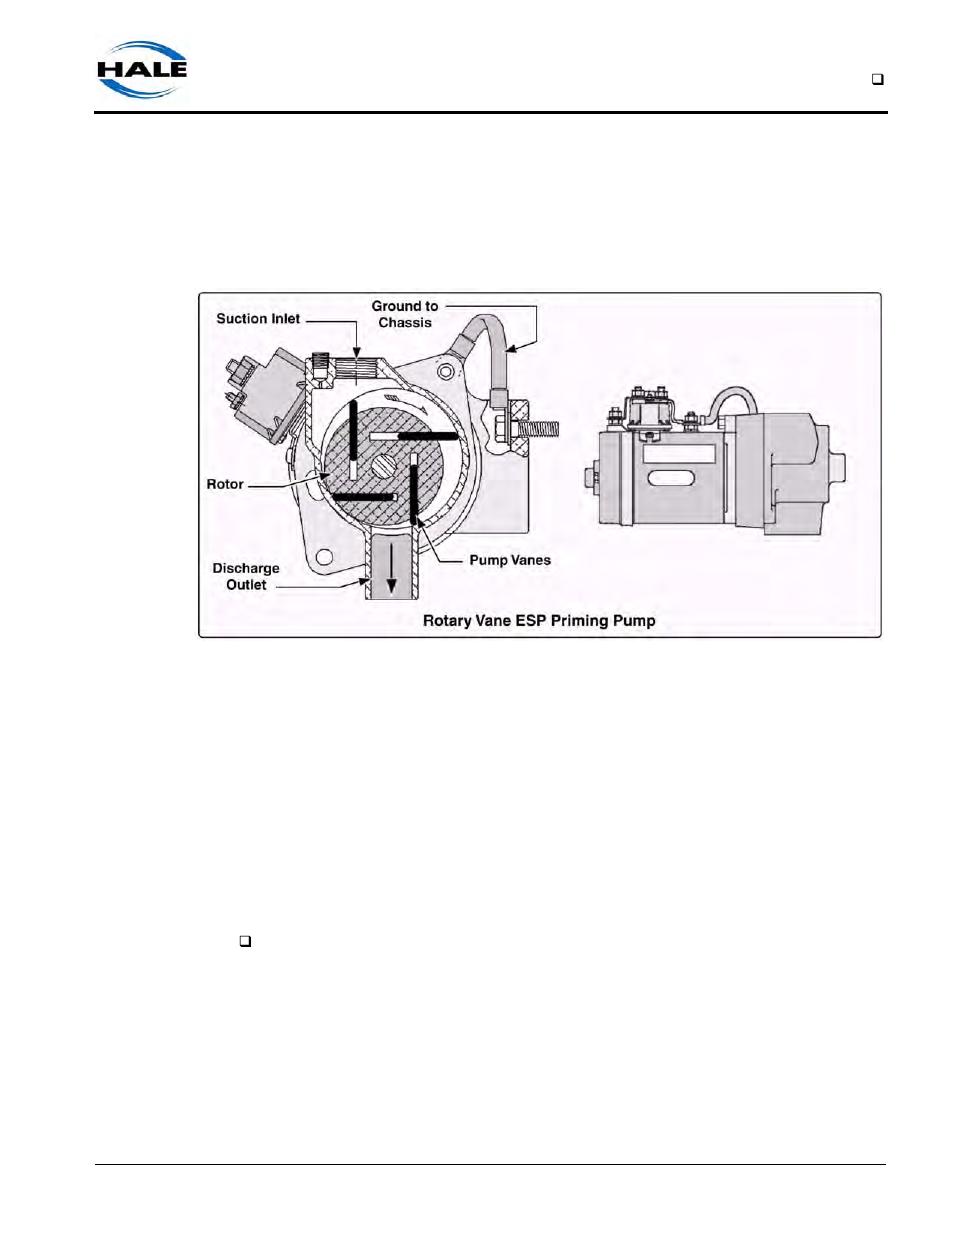 4 priming systems figure 3 5 rotary vane esp priming pump priming rh  manualsdir com Hale